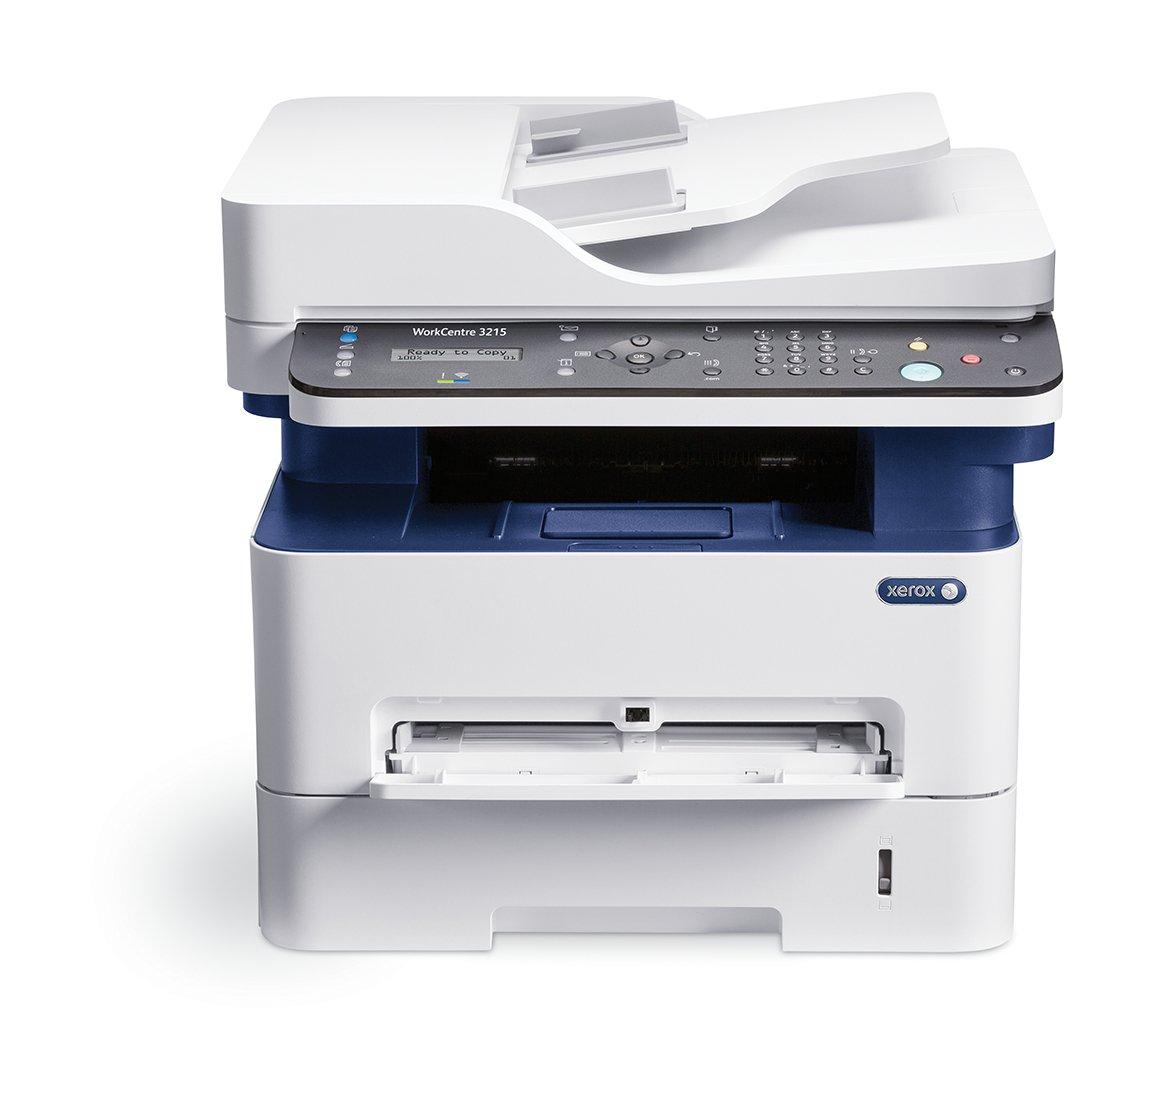 Xerox WorkCentre 3215/NI Monochrome Multifunction Printer